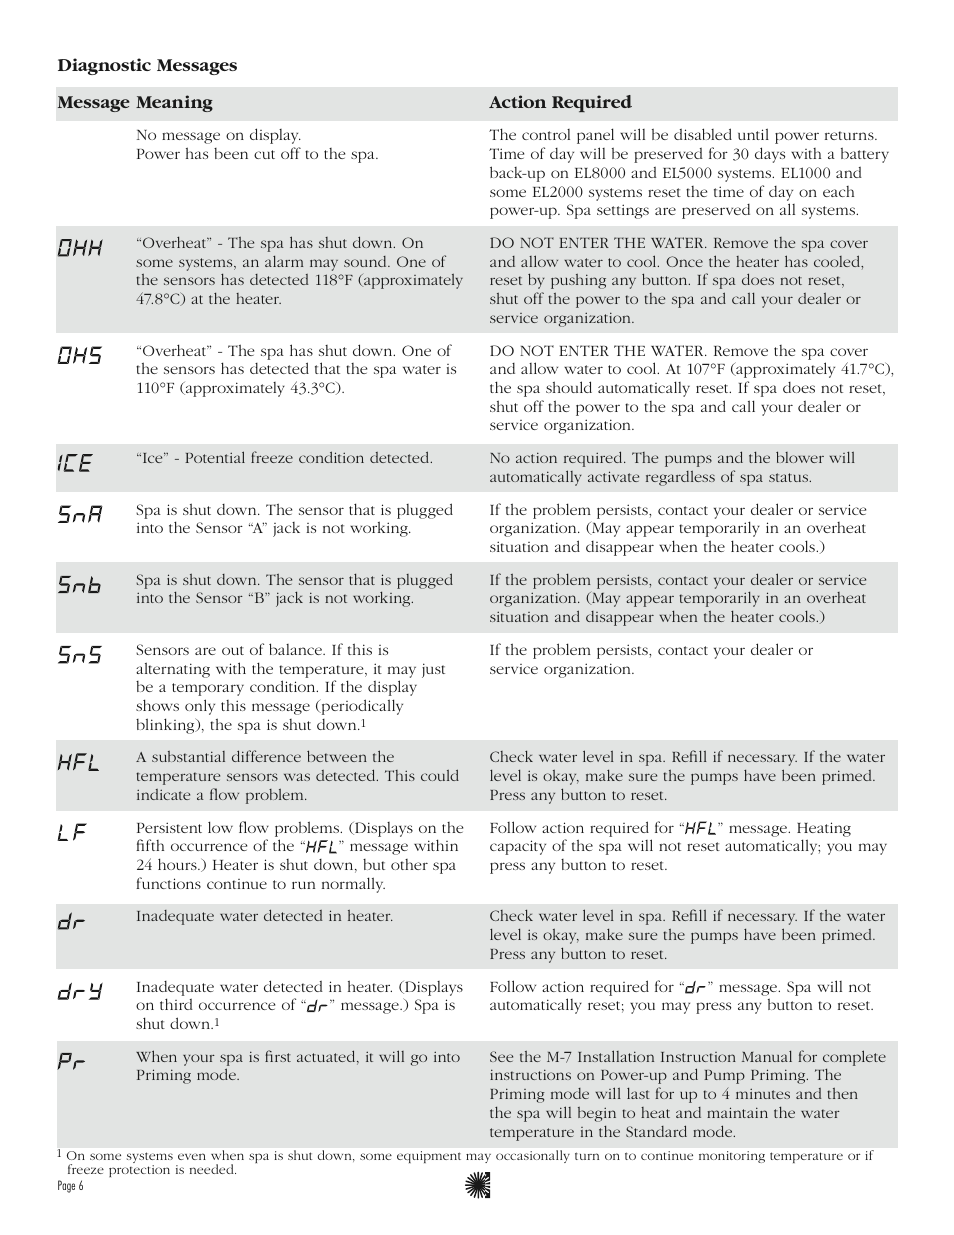 Balboa Water Group Manual Guide